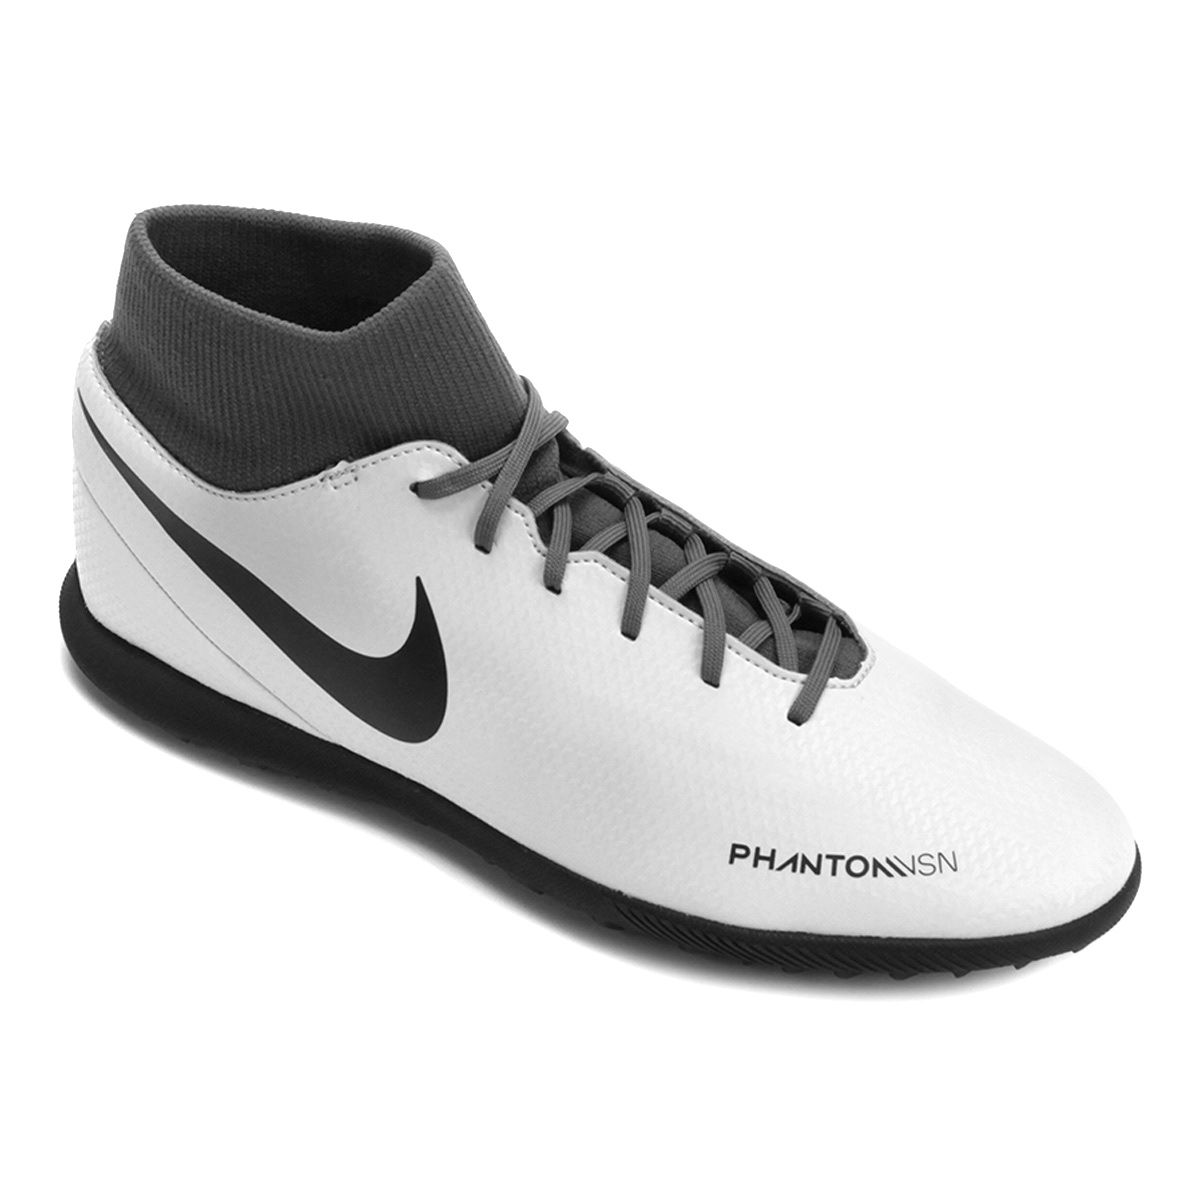 ee608c3946 Chuteira Society Nike Phantom VSN Club DF TF Masculina - Compre Agora